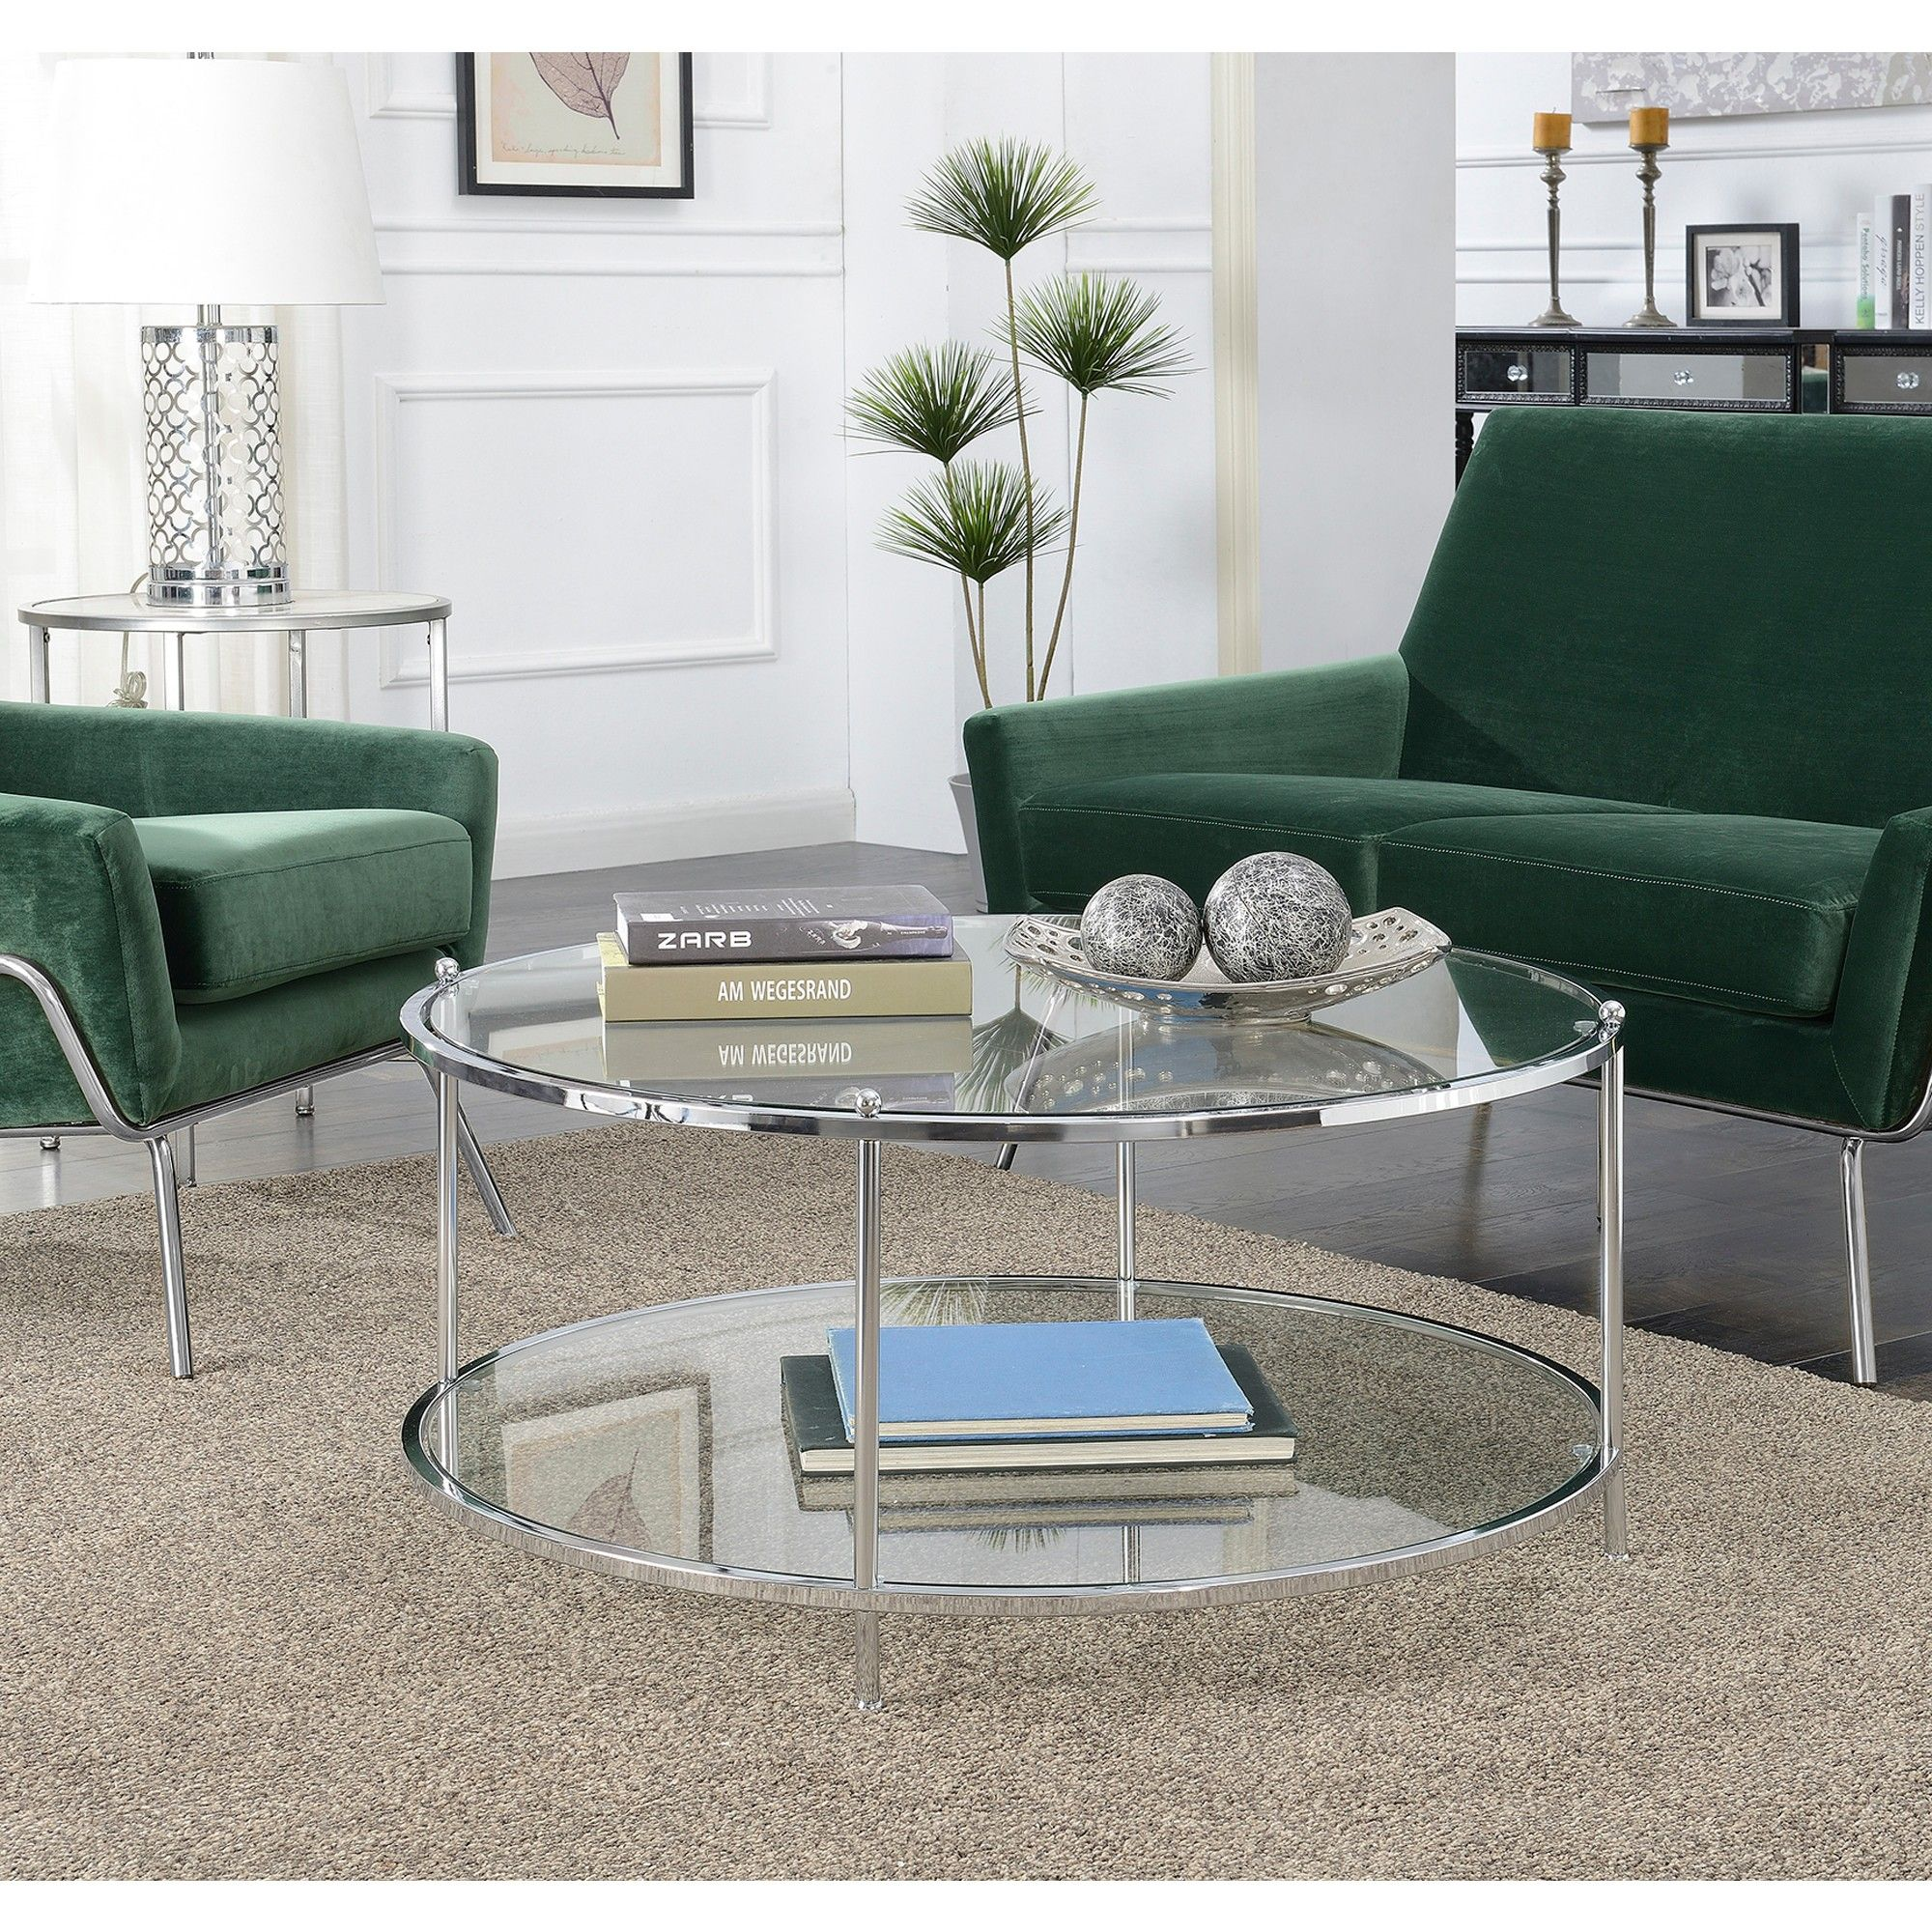 Royal Crest 2 Tier Round Glass Coffee Table Glass Chrome Johar